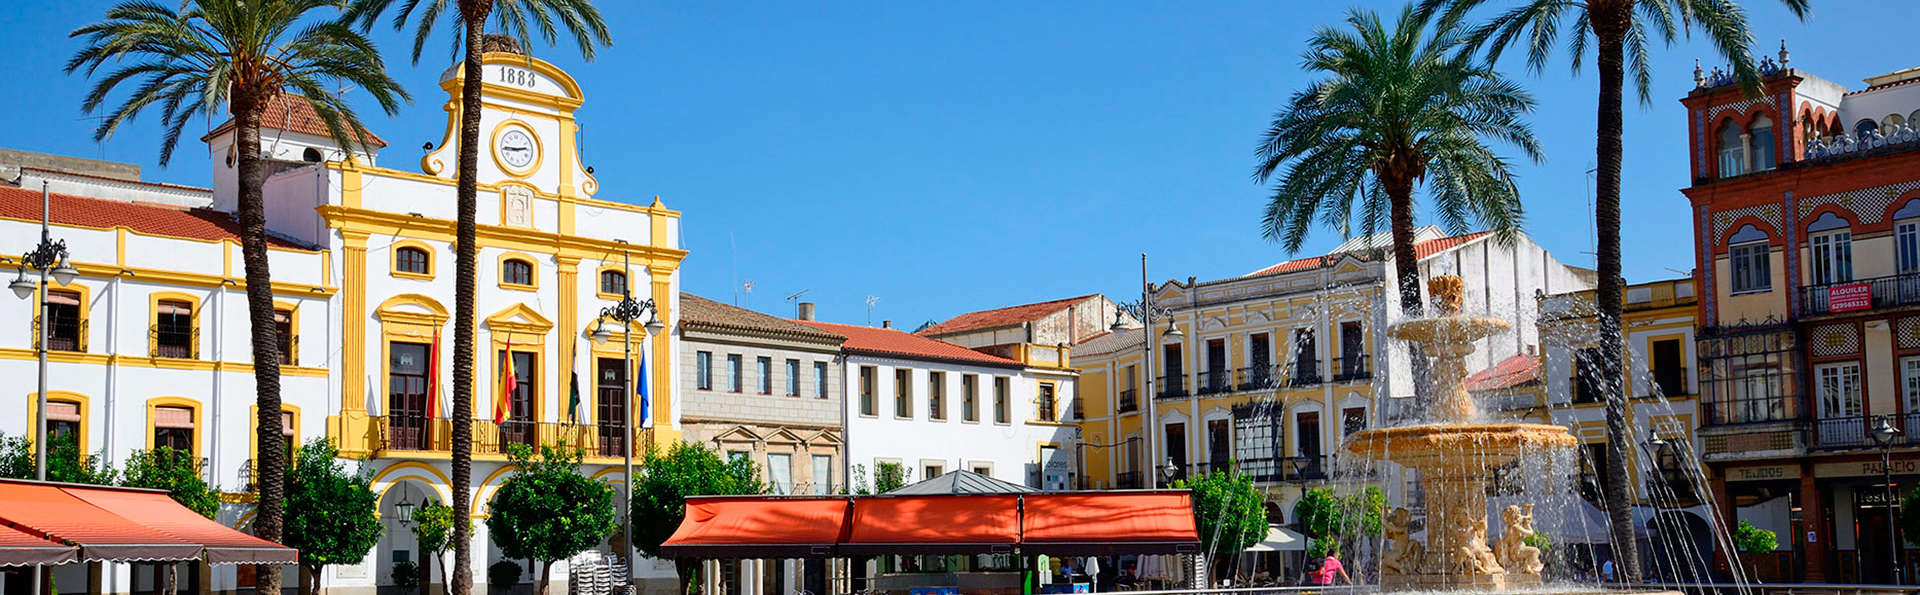 Hotel Spa Adealba Mérida - EDIT_destination.jpg